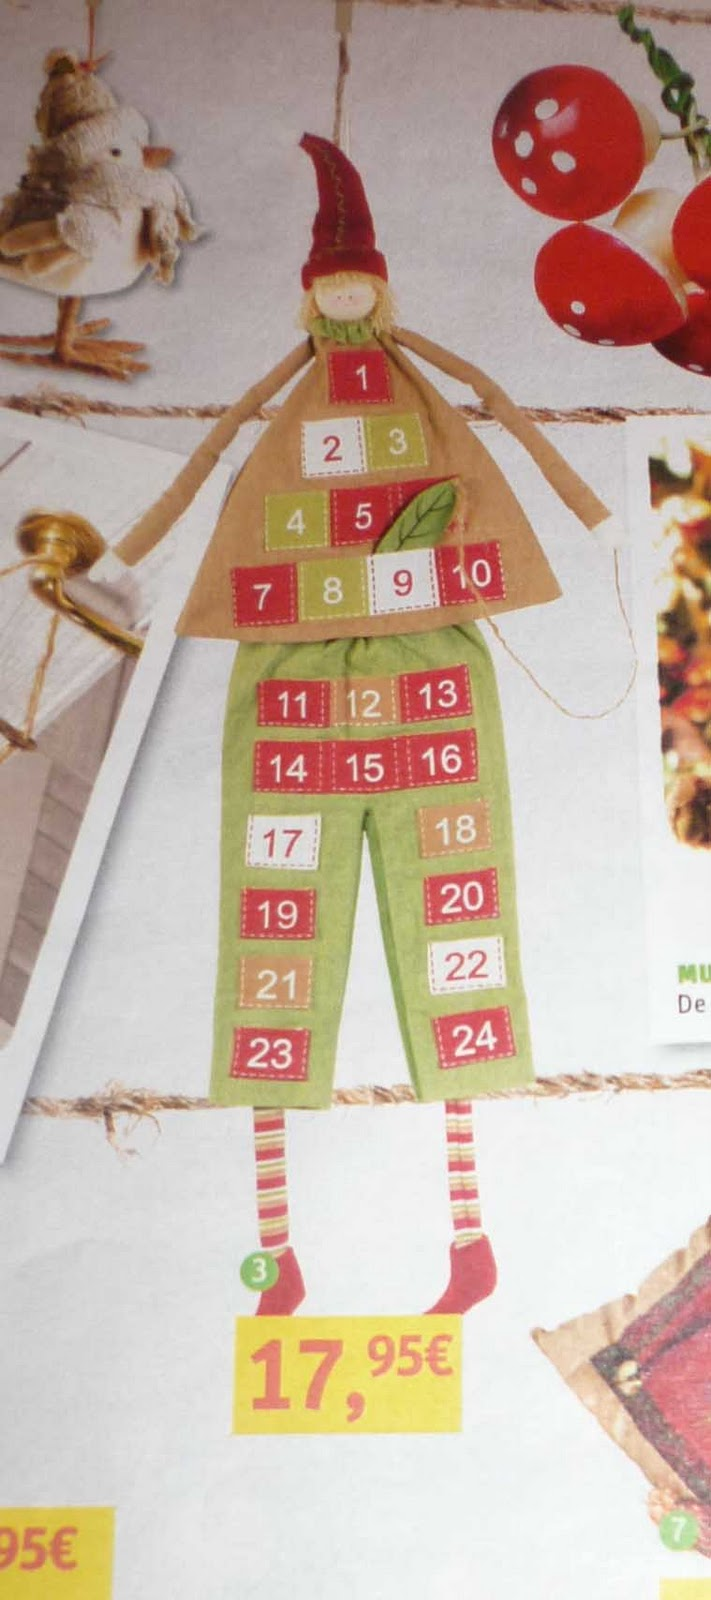 Calendario De Adviento Txikis Del Bidasoa